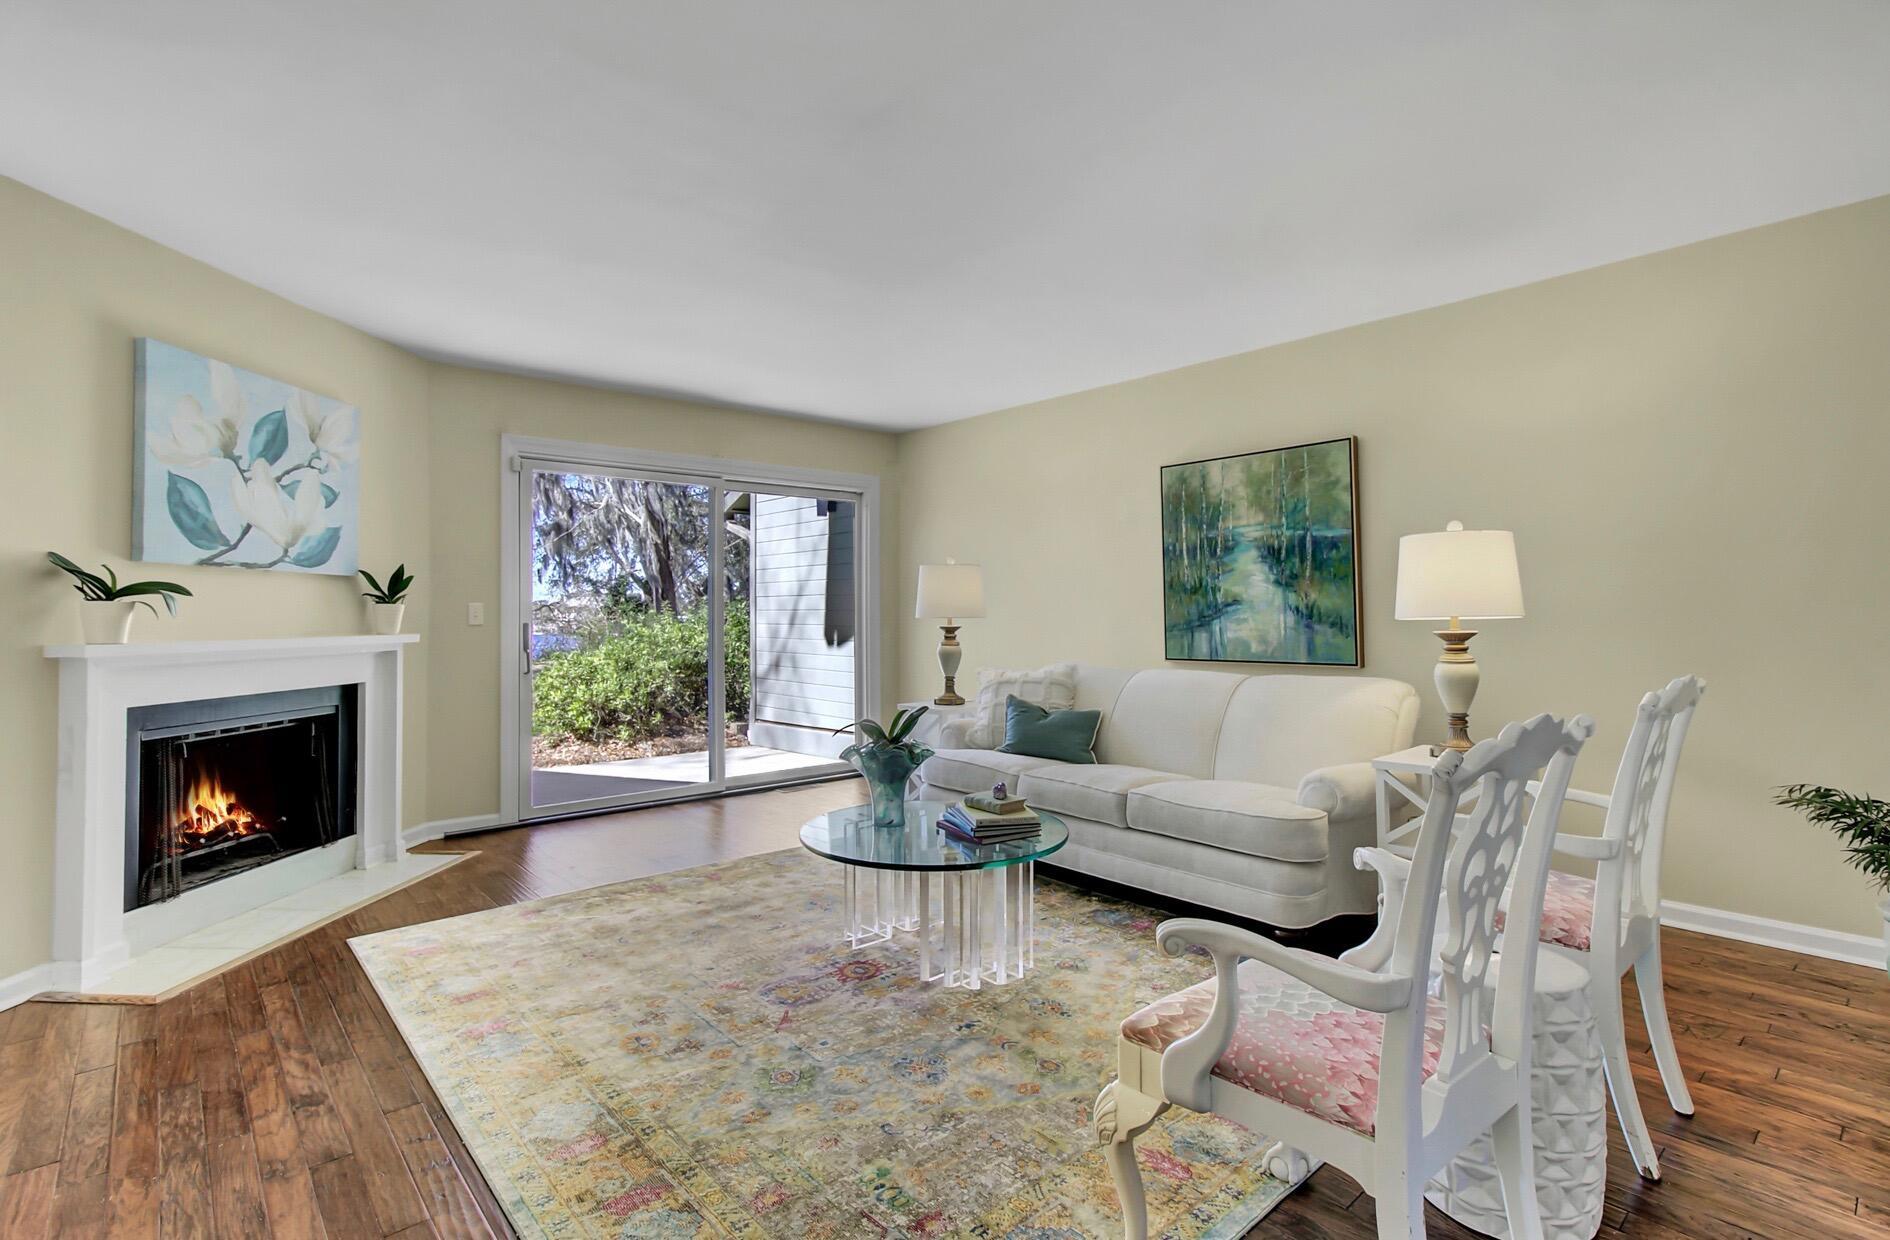 Wappoo Creek Place Homes For Sale - 29 Wappoo Creek, Charleston, SC - 31